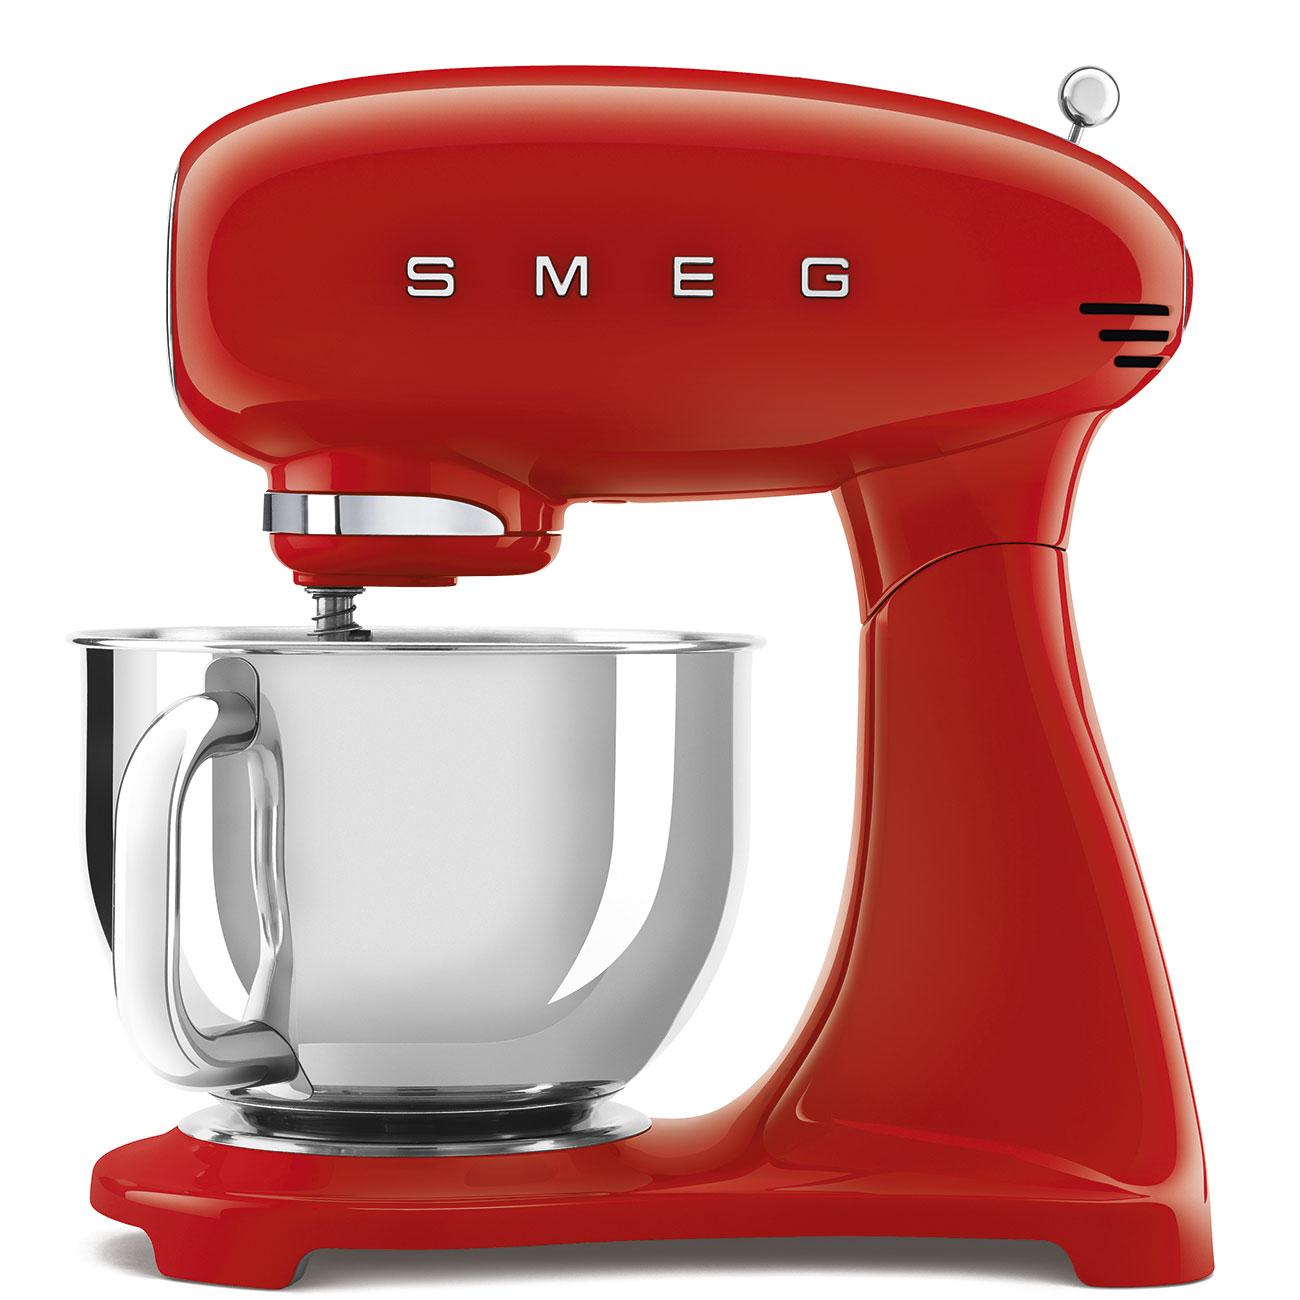 Smeg Retro Kitchen Machine 4.8L Bowl 10 Speed Red